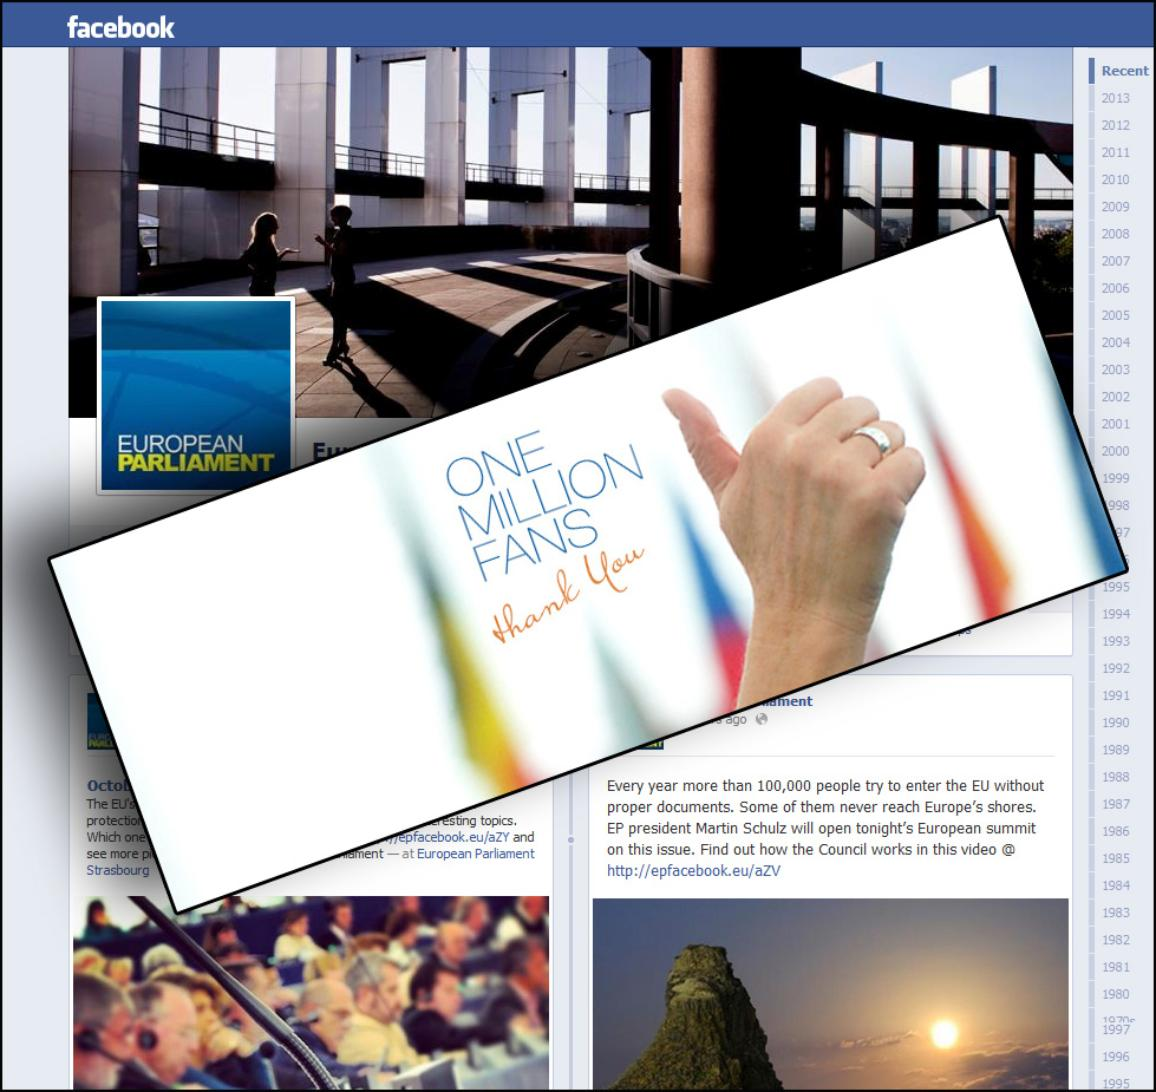 European Parliament's Facebook page reaches one million fans